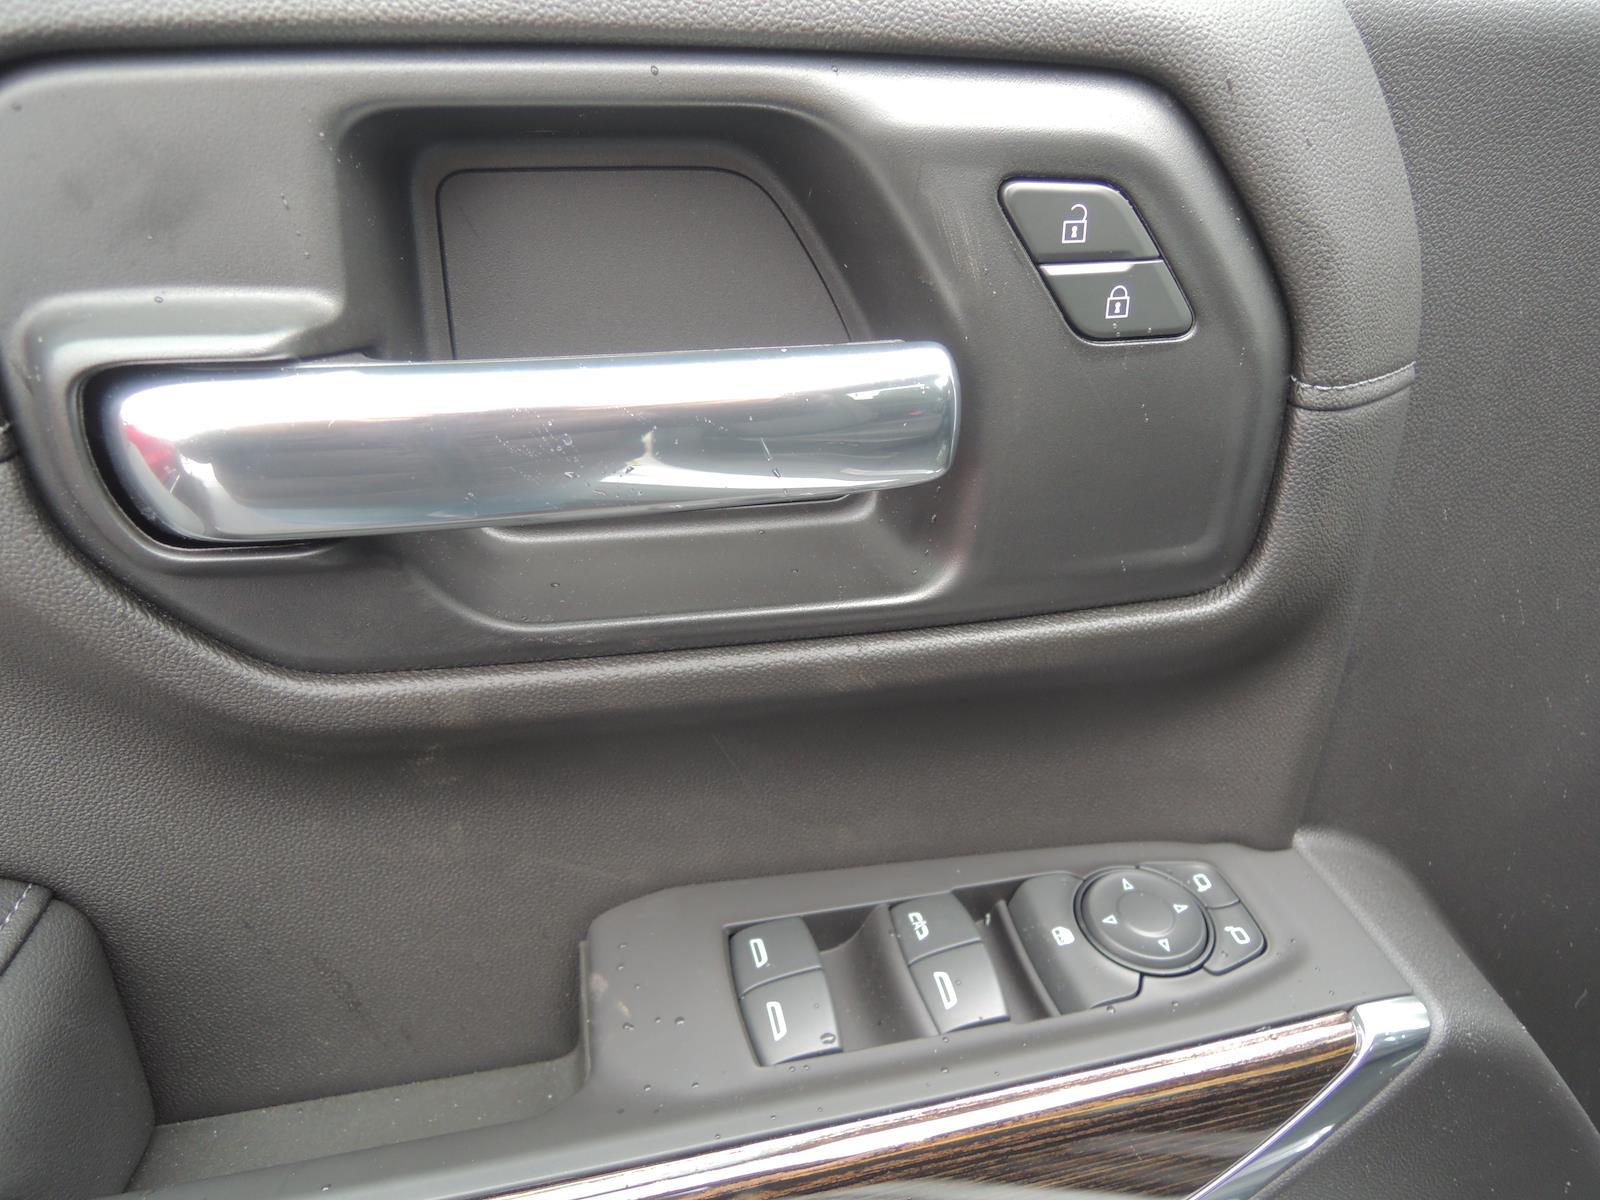 2021 GMC Sierra 1500 Double Cab 4x2, Pickup #MT727 - photo 18